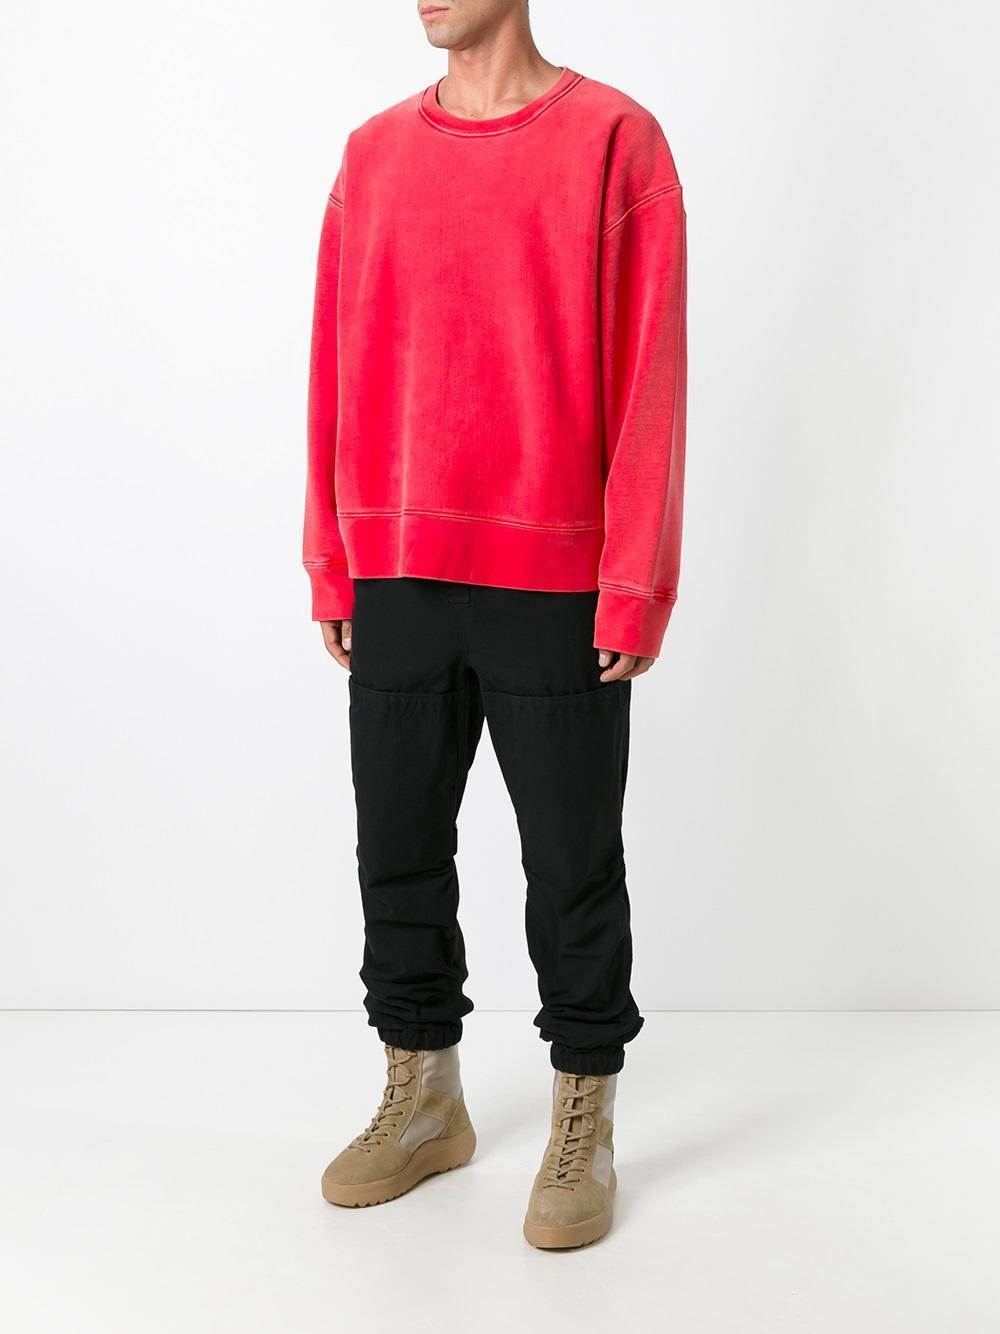 lyst yeezy season 3 crew neck sweatshirt in red. Black Bedroom Furniture Sets. Home Design Ideas